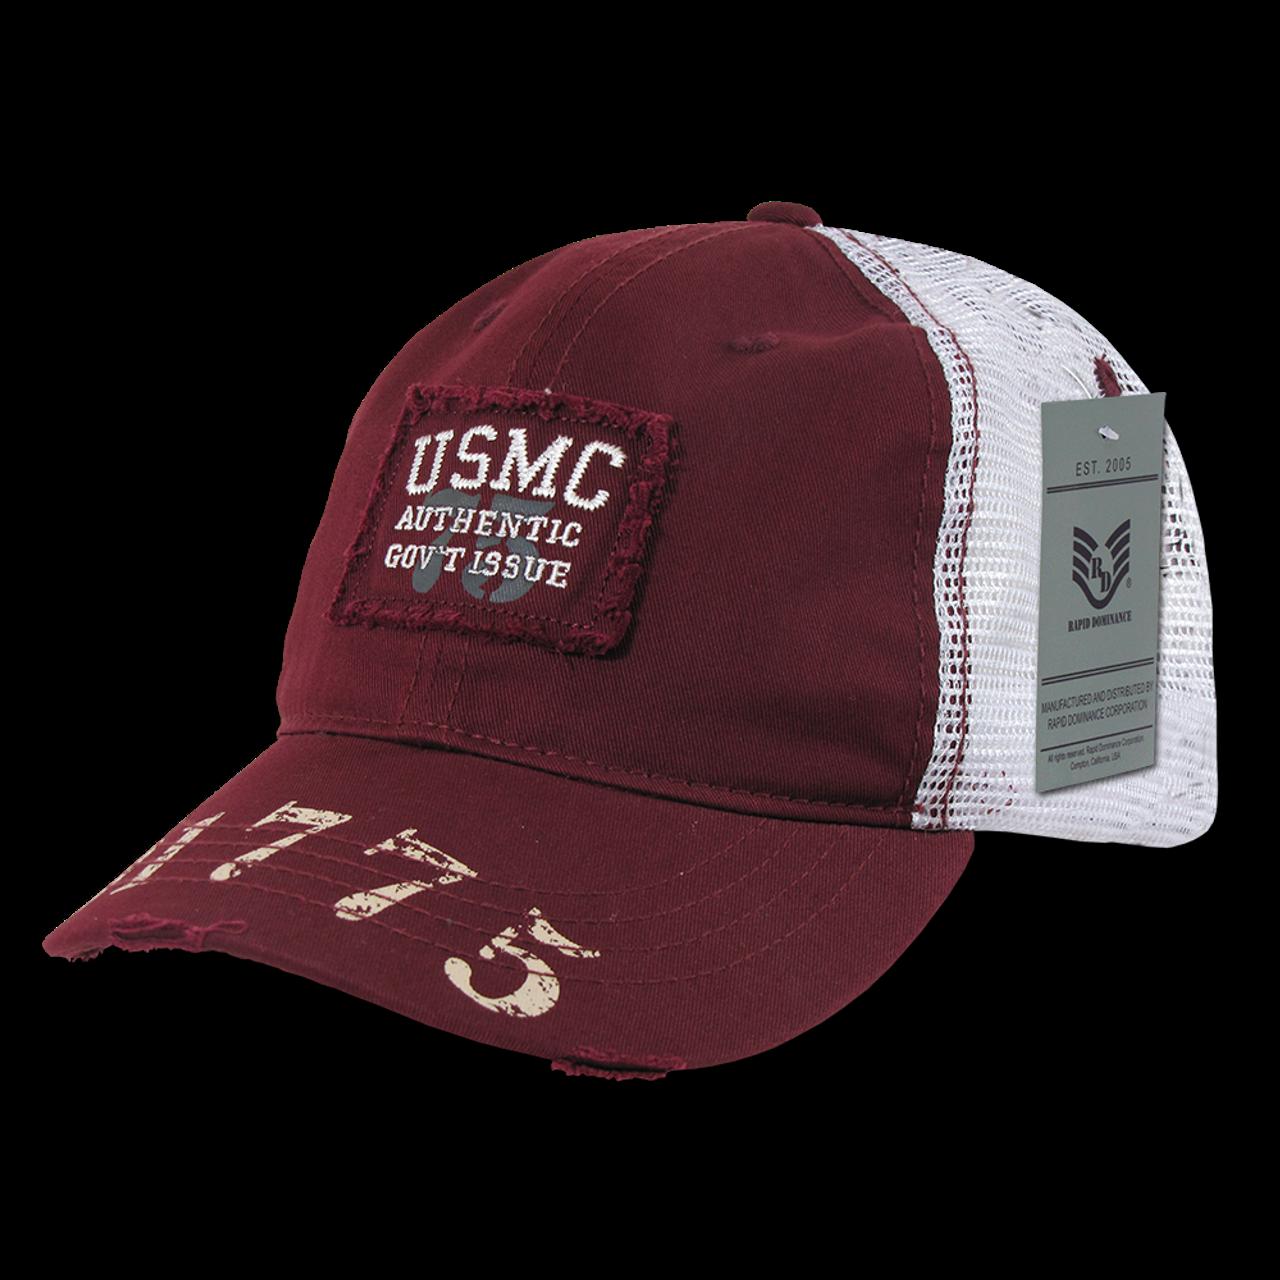 a6b1b9a9ea0 ... S85 - Marines Cap USMC Vintage Military Patch Mesh Maroon ...